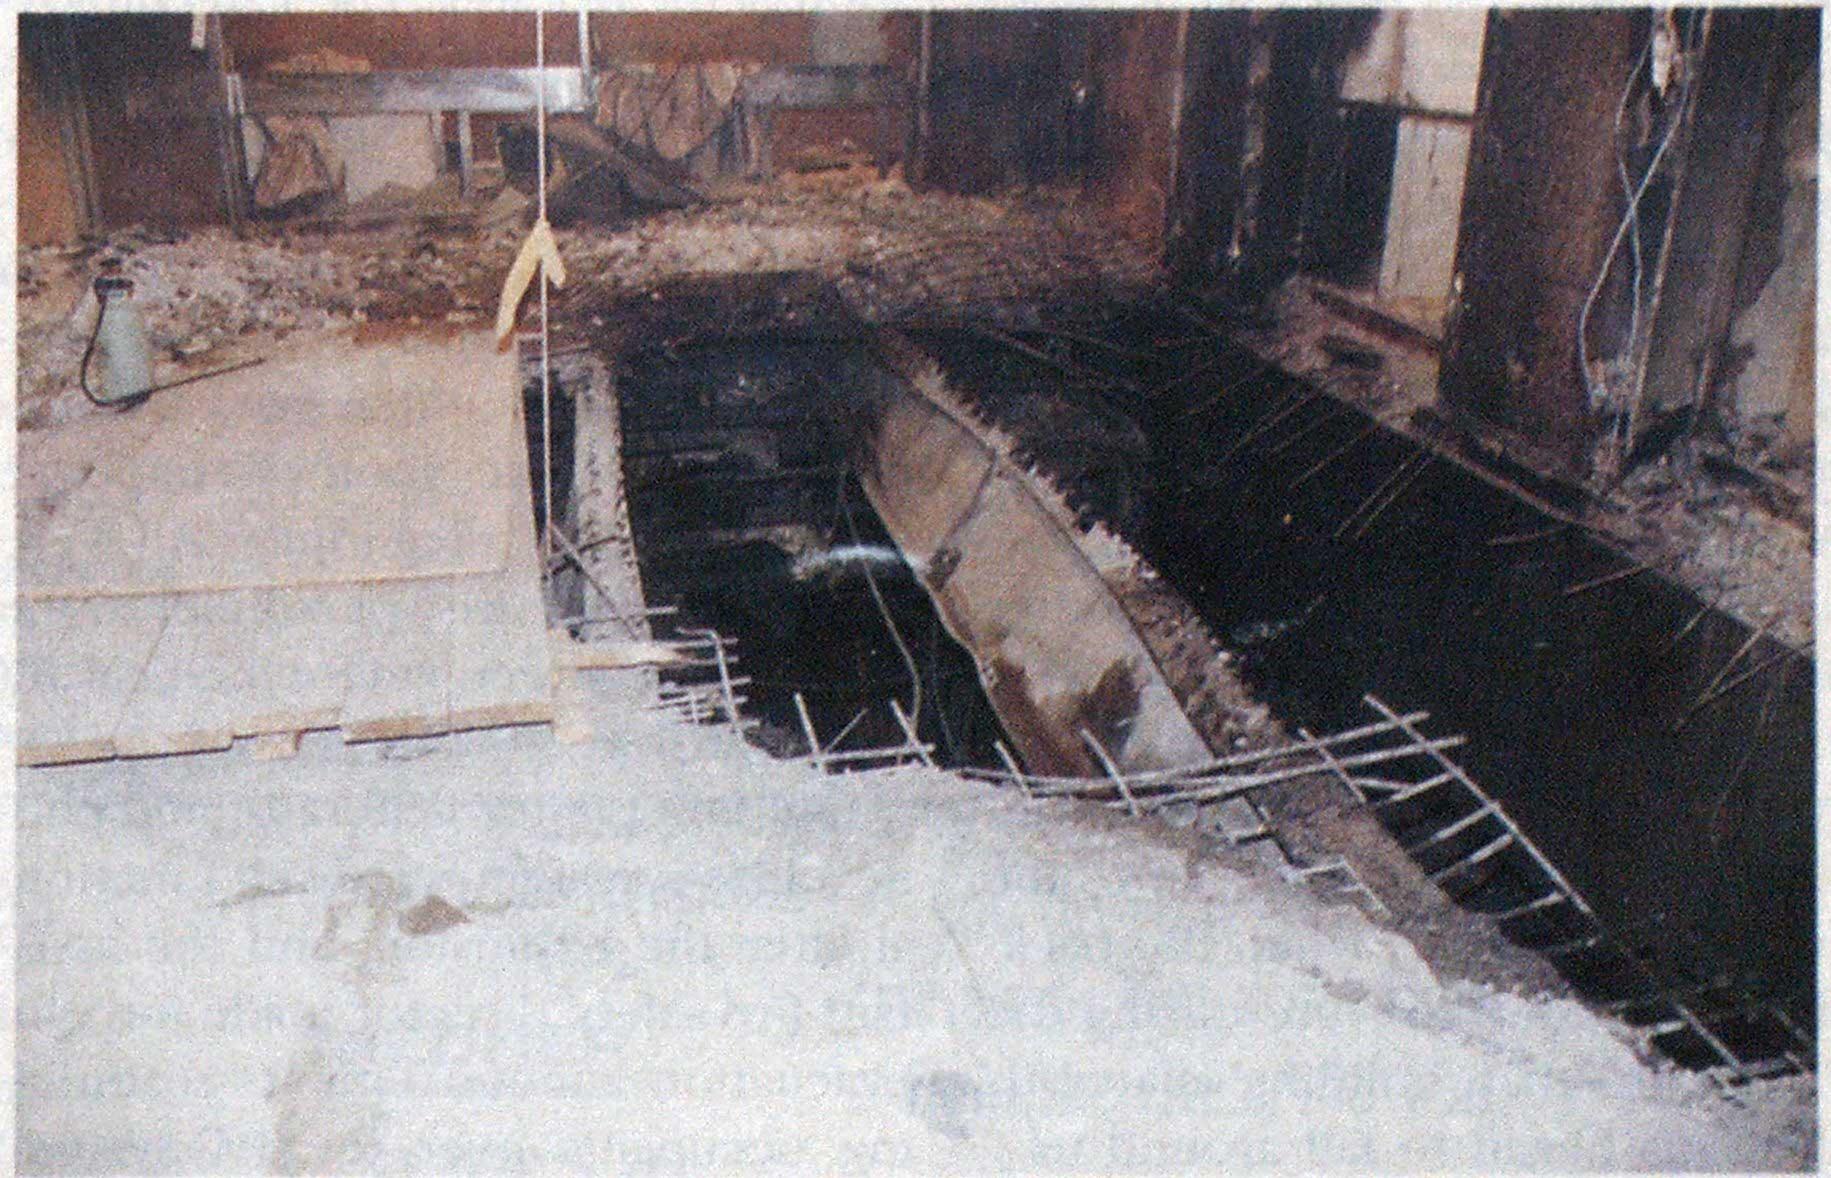 World Trade Center 1993 attack